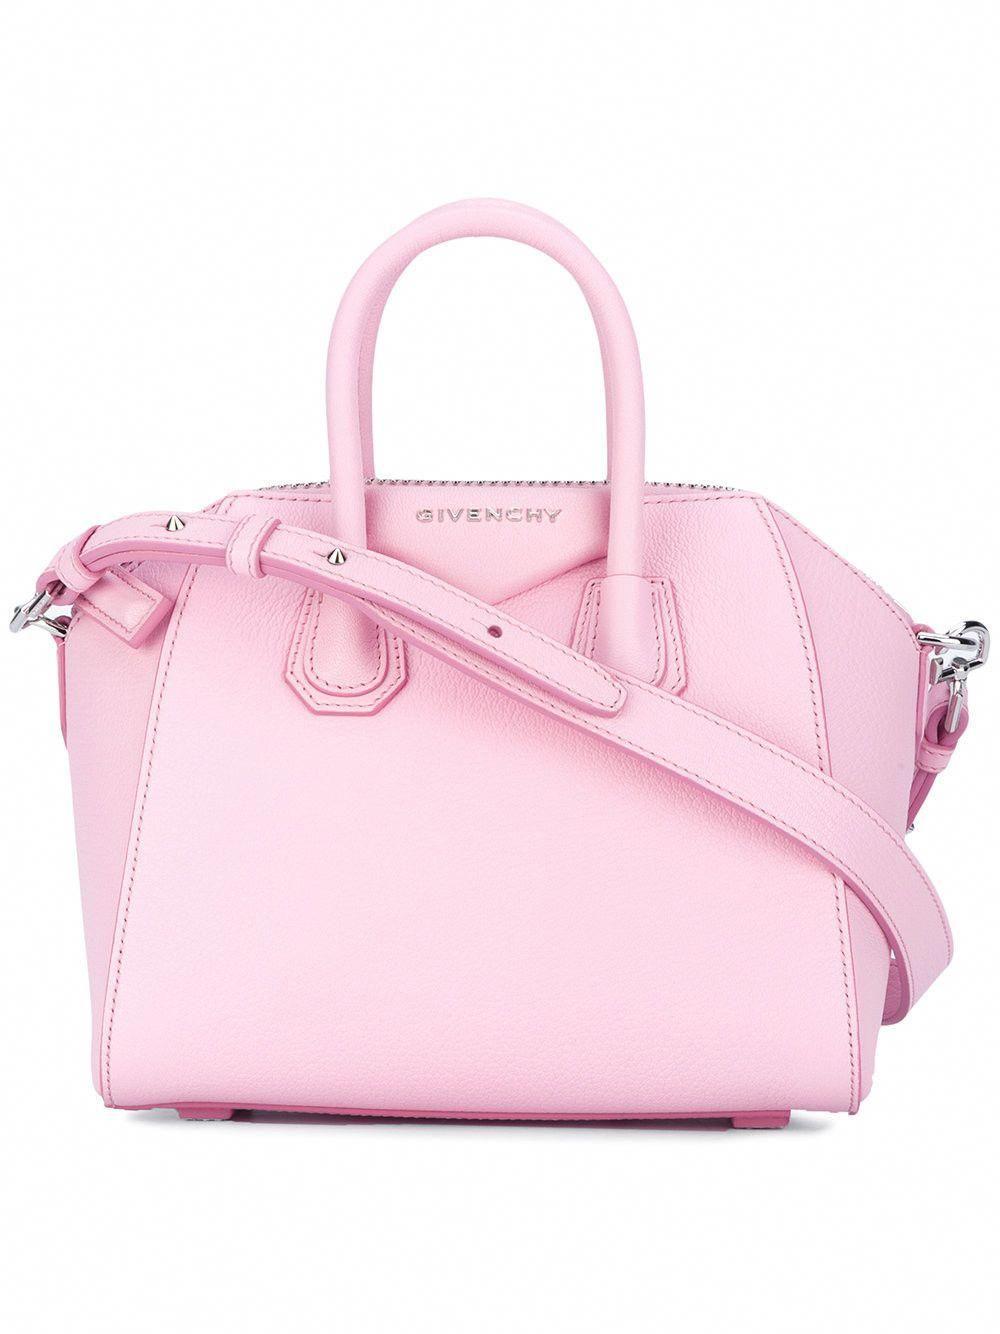 GIVENCHY mini Antigona tote.  givenchy  bags  shoulder bags  hand bags  tote     Designerhandbags 60c24a0153b01